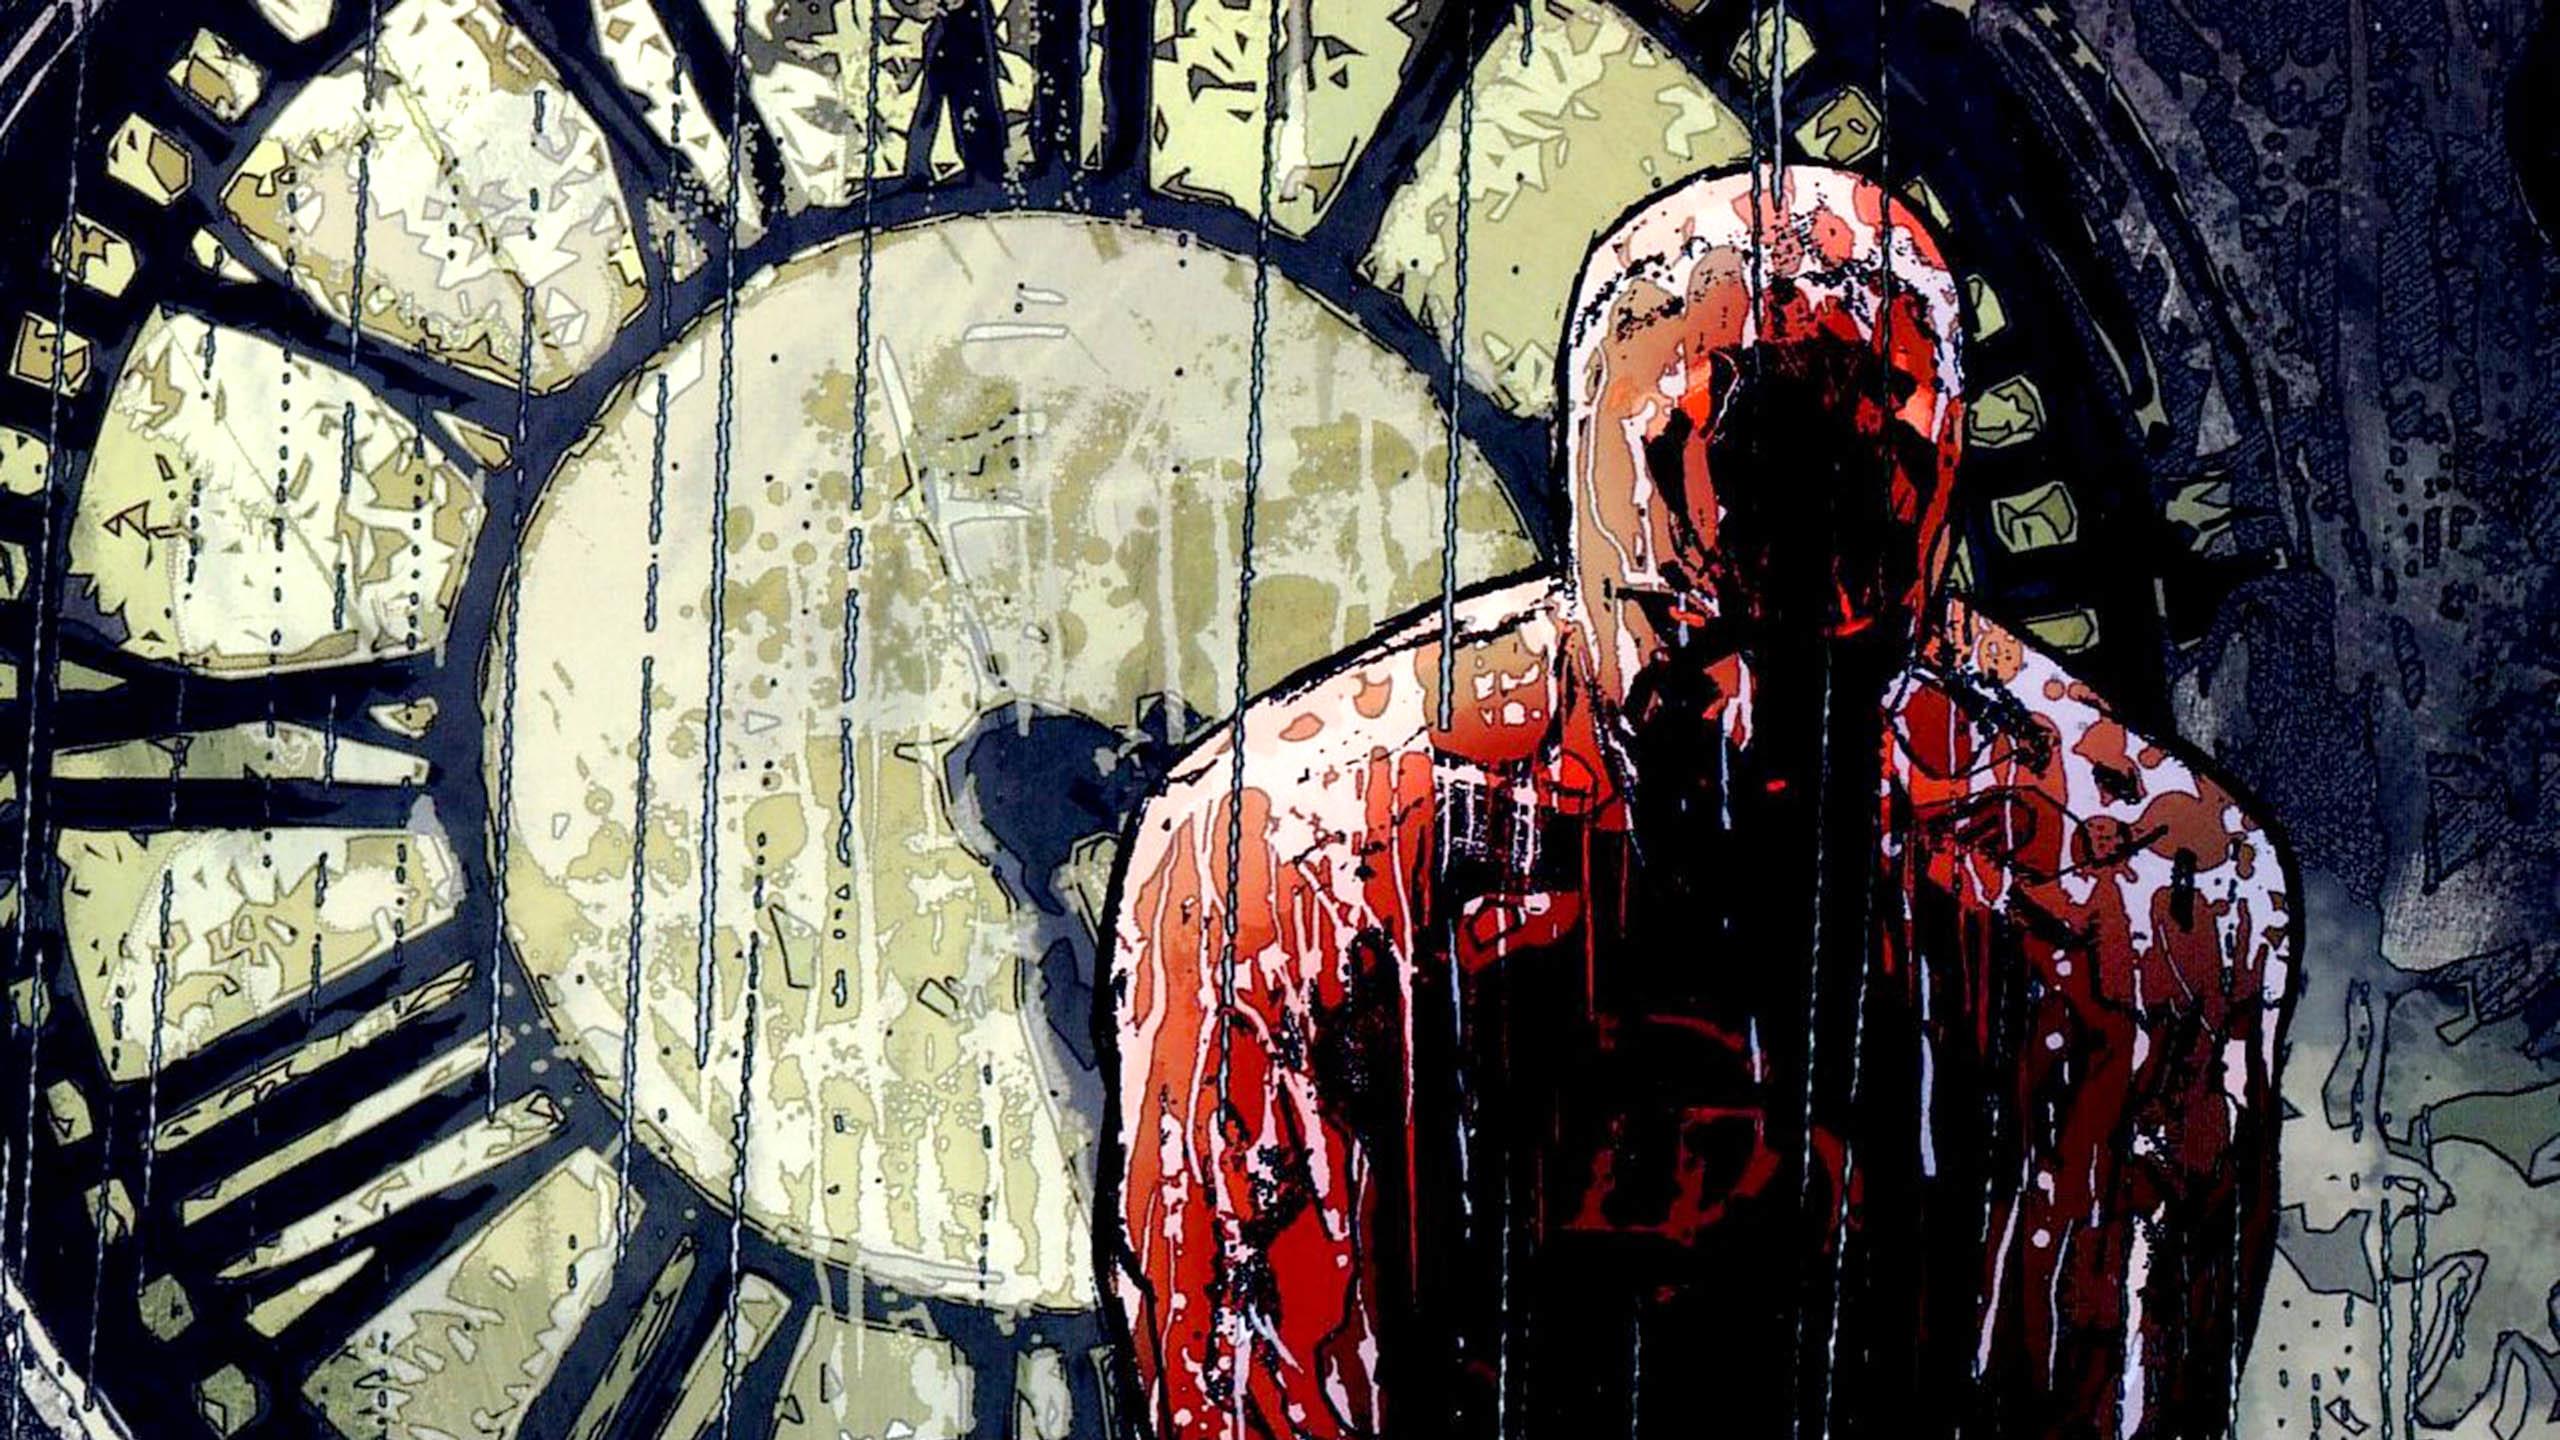 Films-Daredevil-Wallpapers-High-Resolution